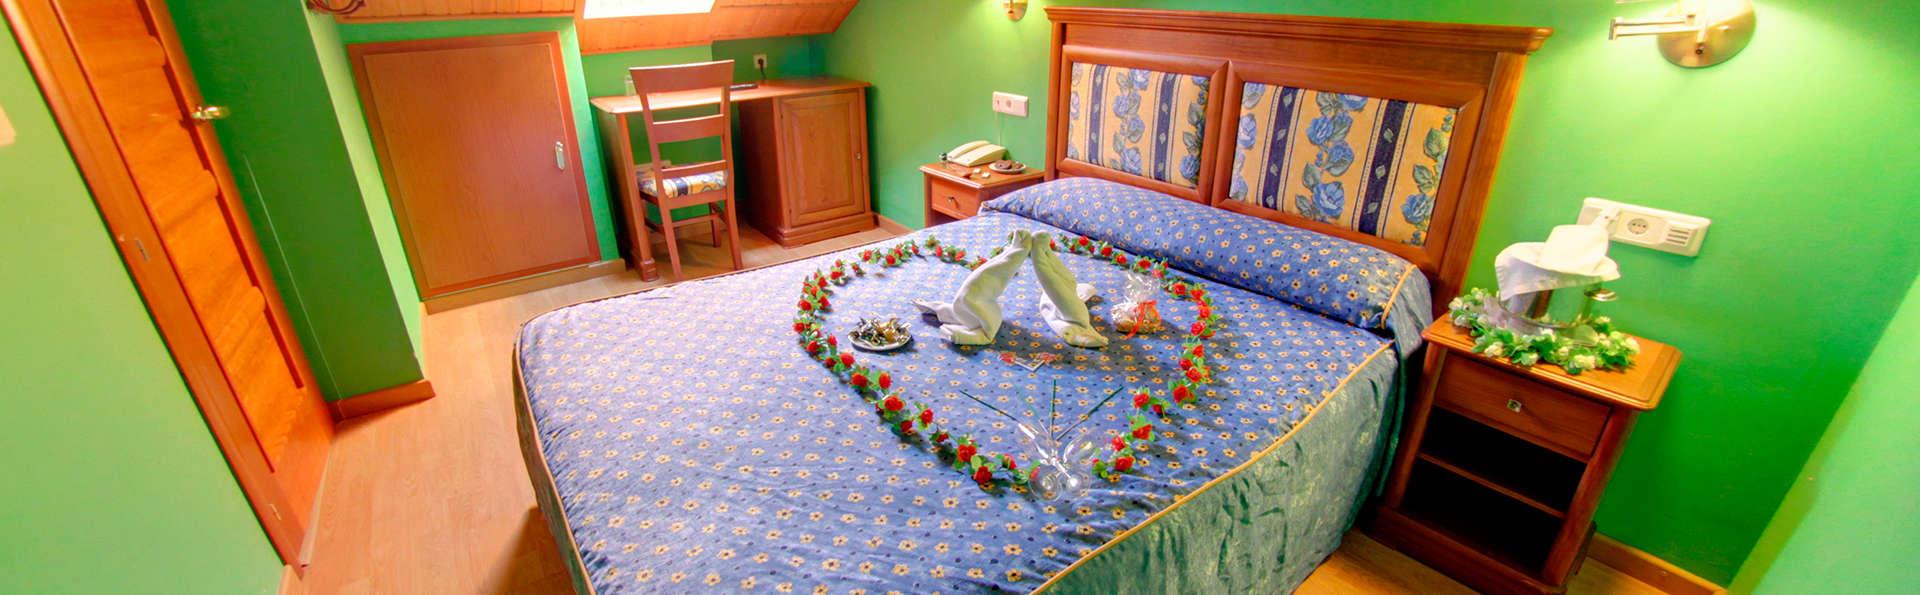 Hotel Balneario Parque de Cazorla - EDIT_room2.jpg